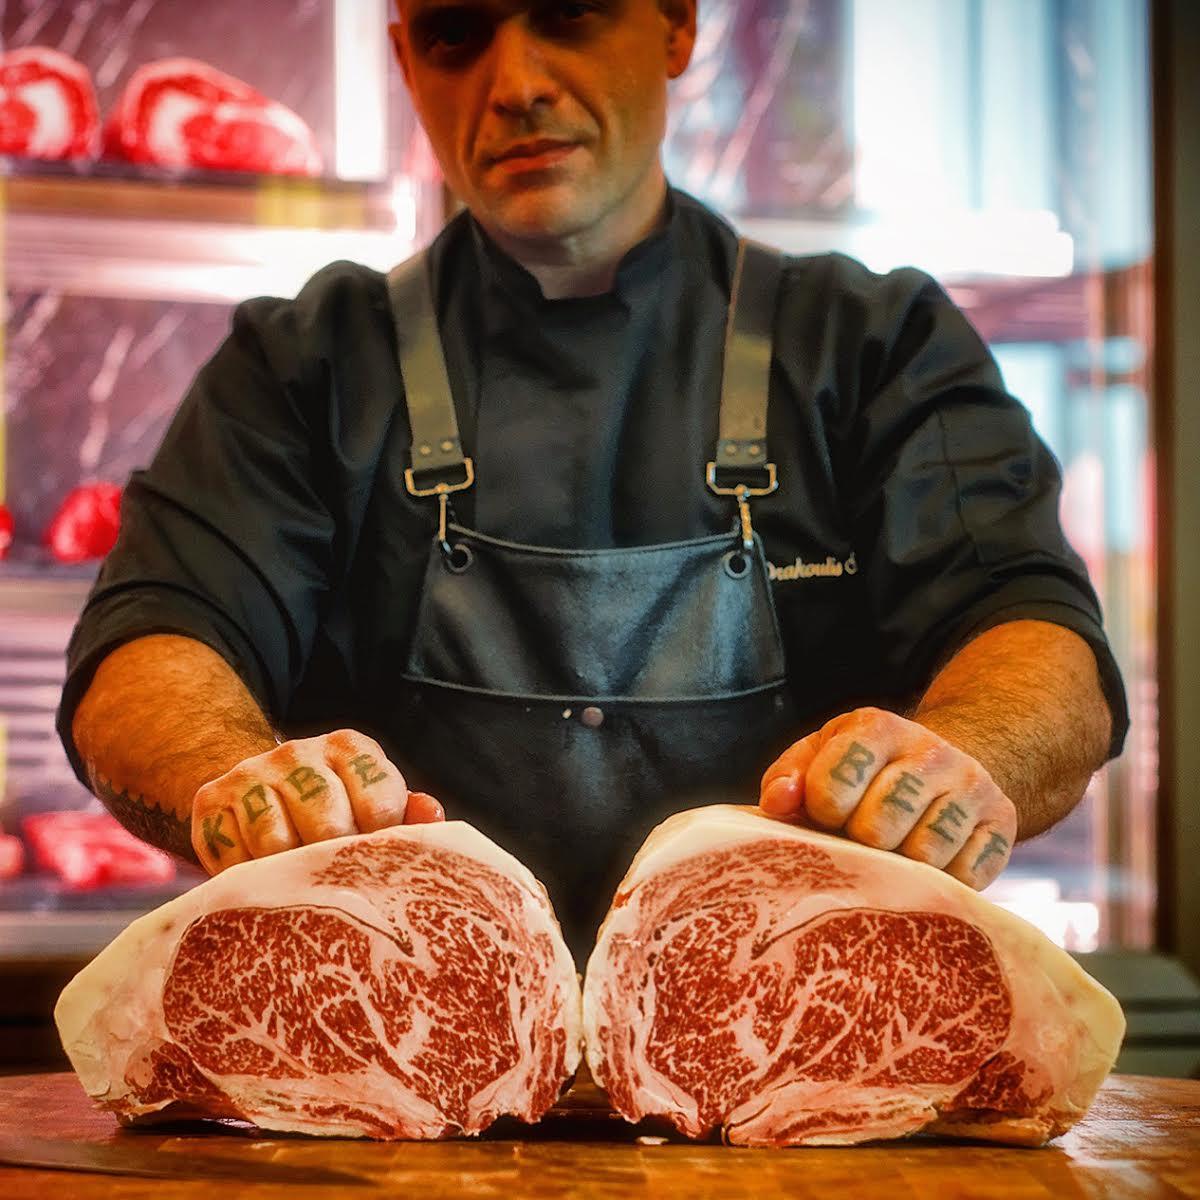 Beefbar Monaco Argentinean Malbec And Prime Beef Gourmet Dinner